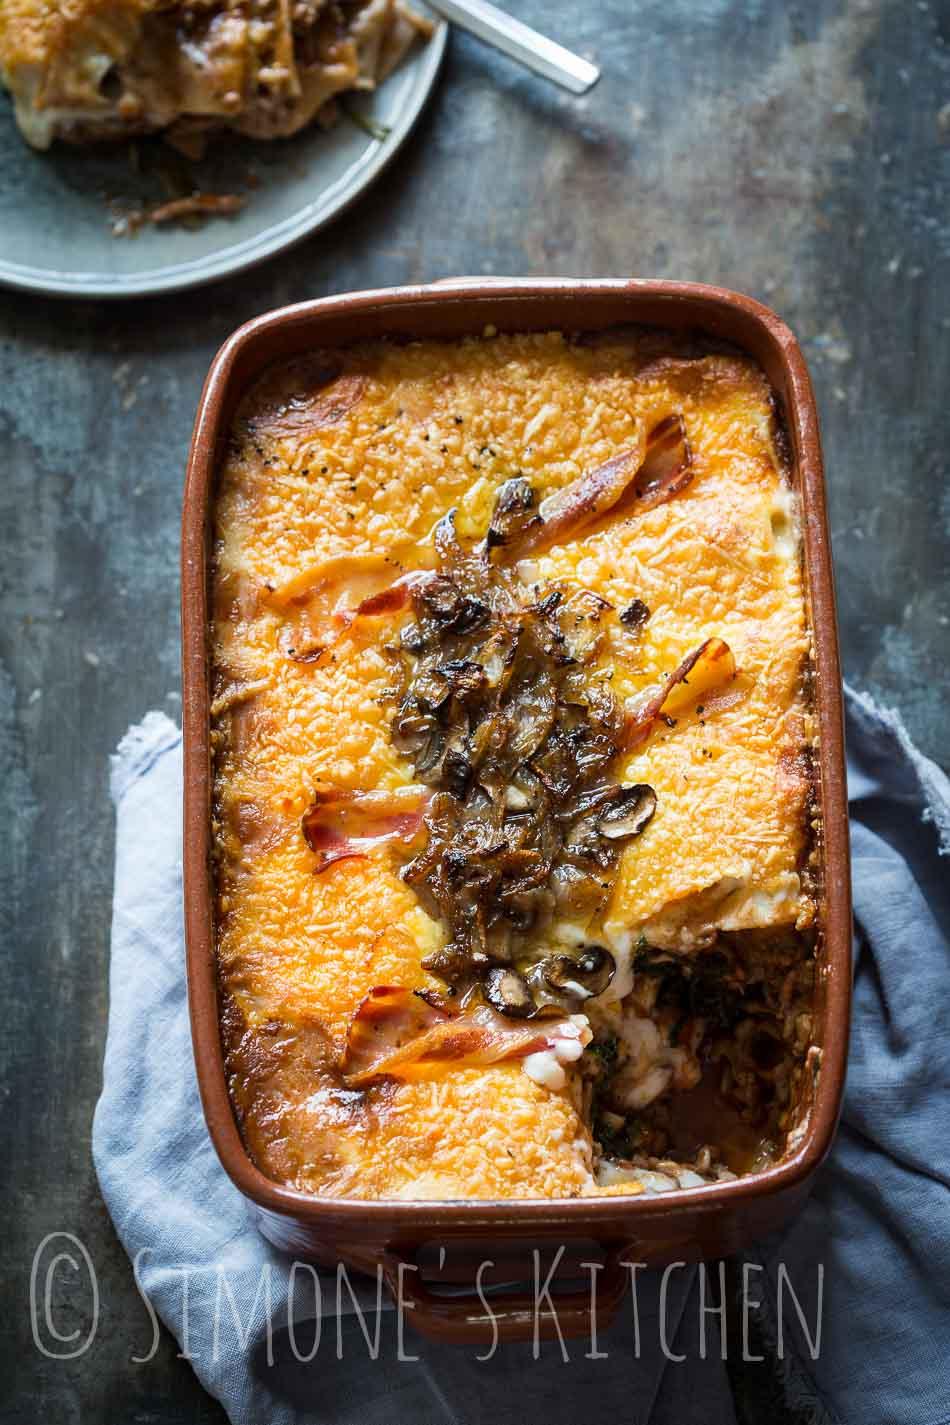 Lekkerste lasagna | simoneskitchen.nl